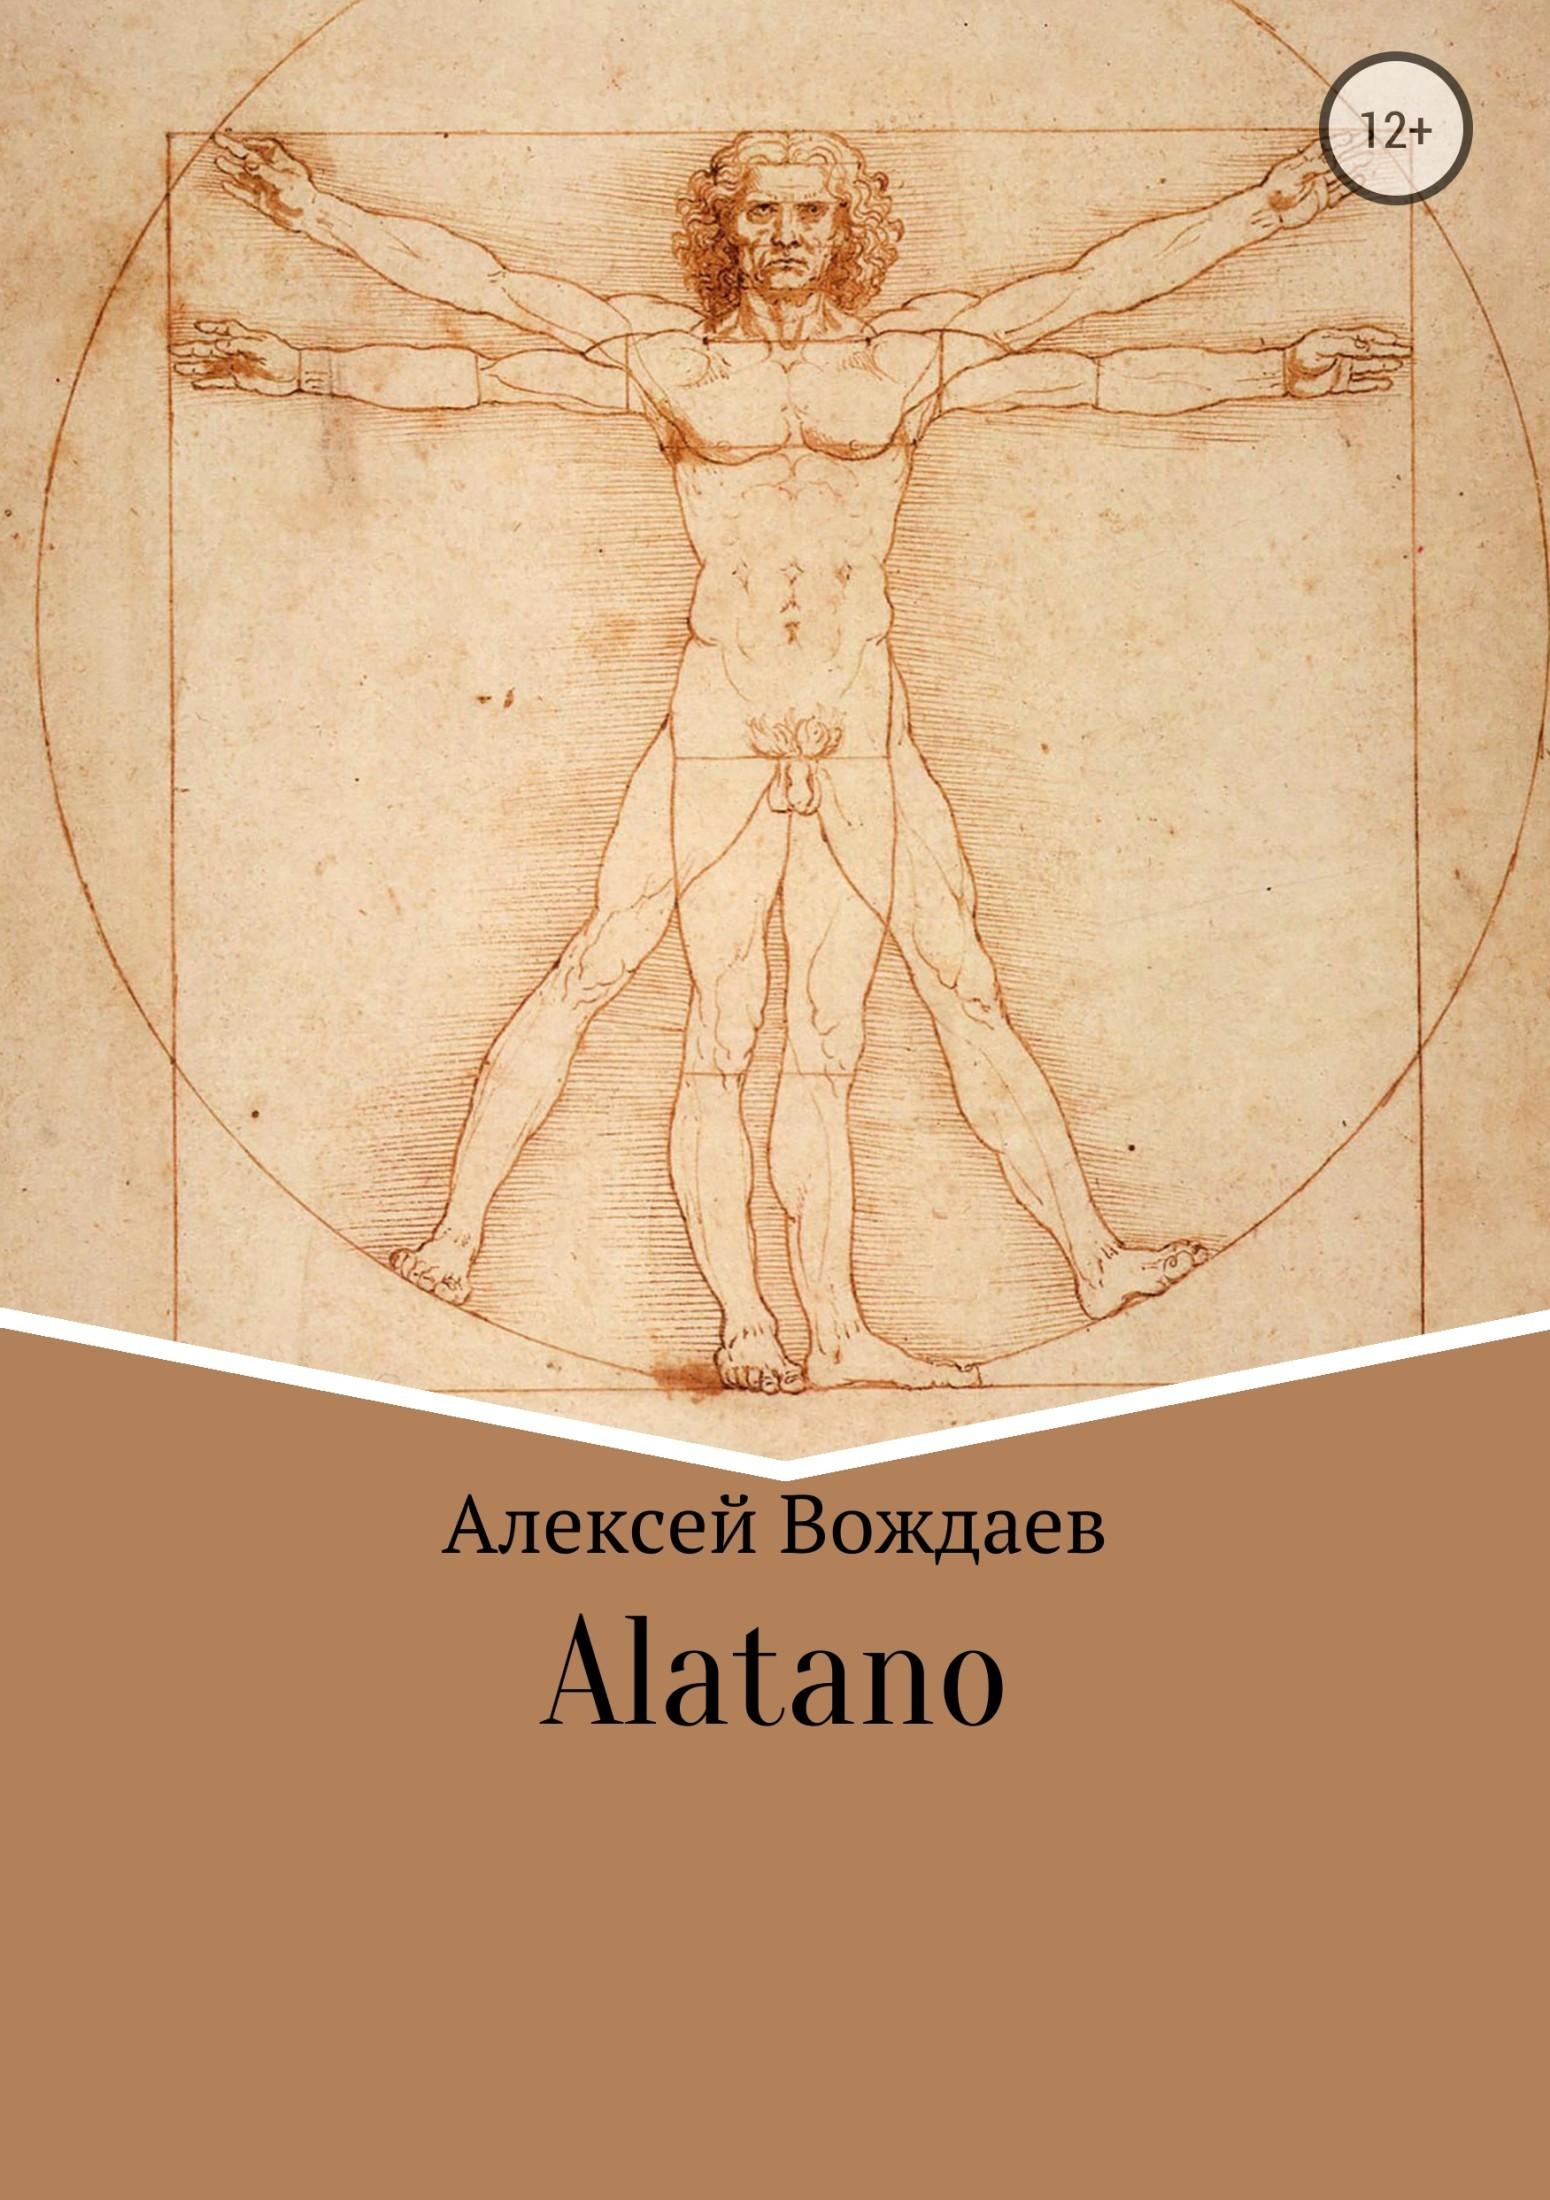 Алексей Михайлович Вождаев Alatano